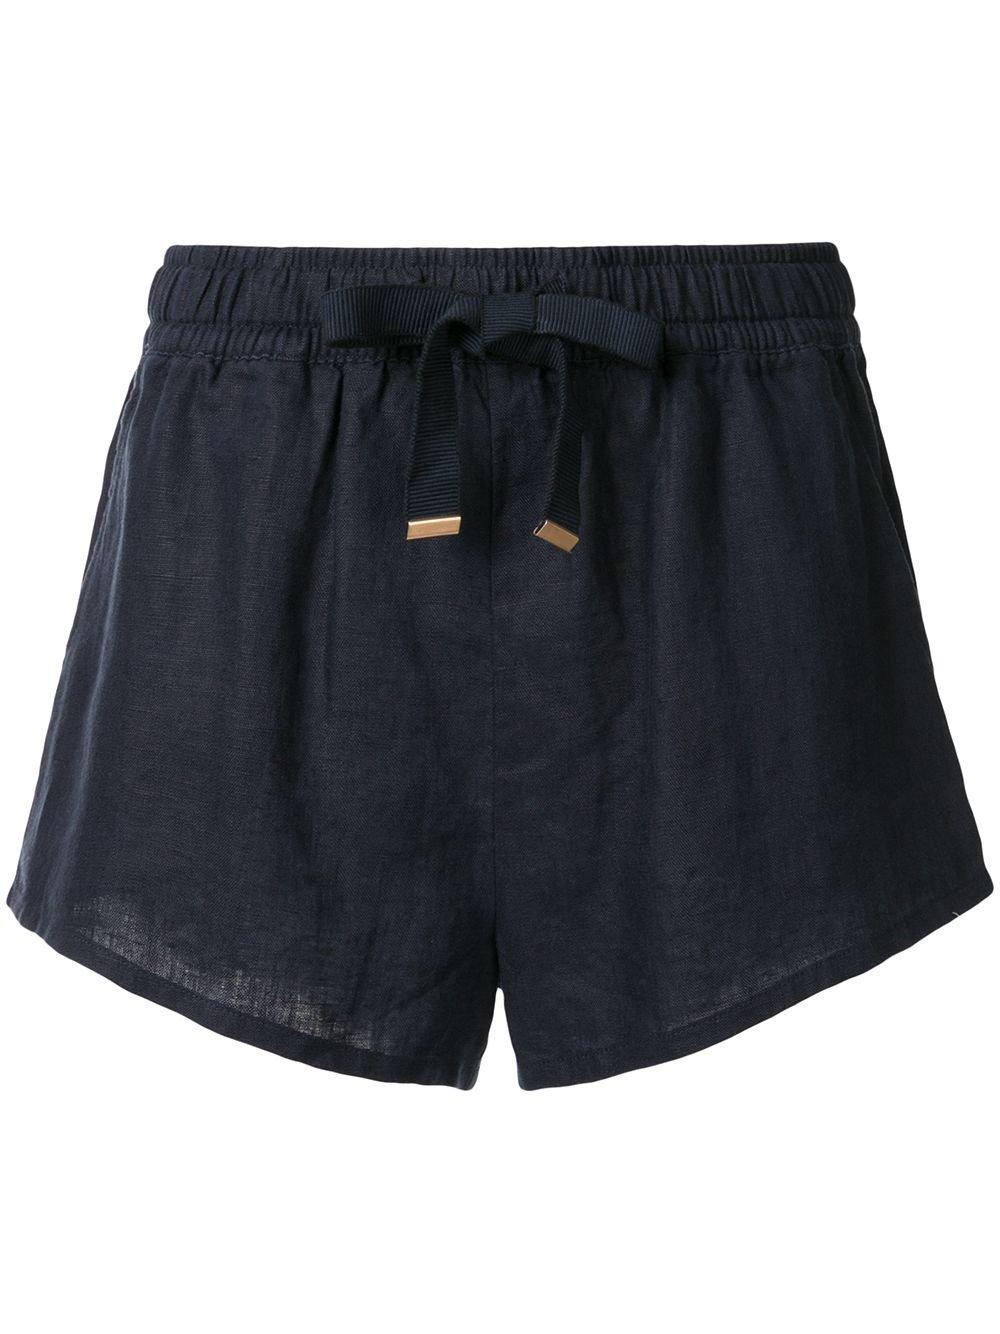 Venroy Short Linen Shorts - Farfetch